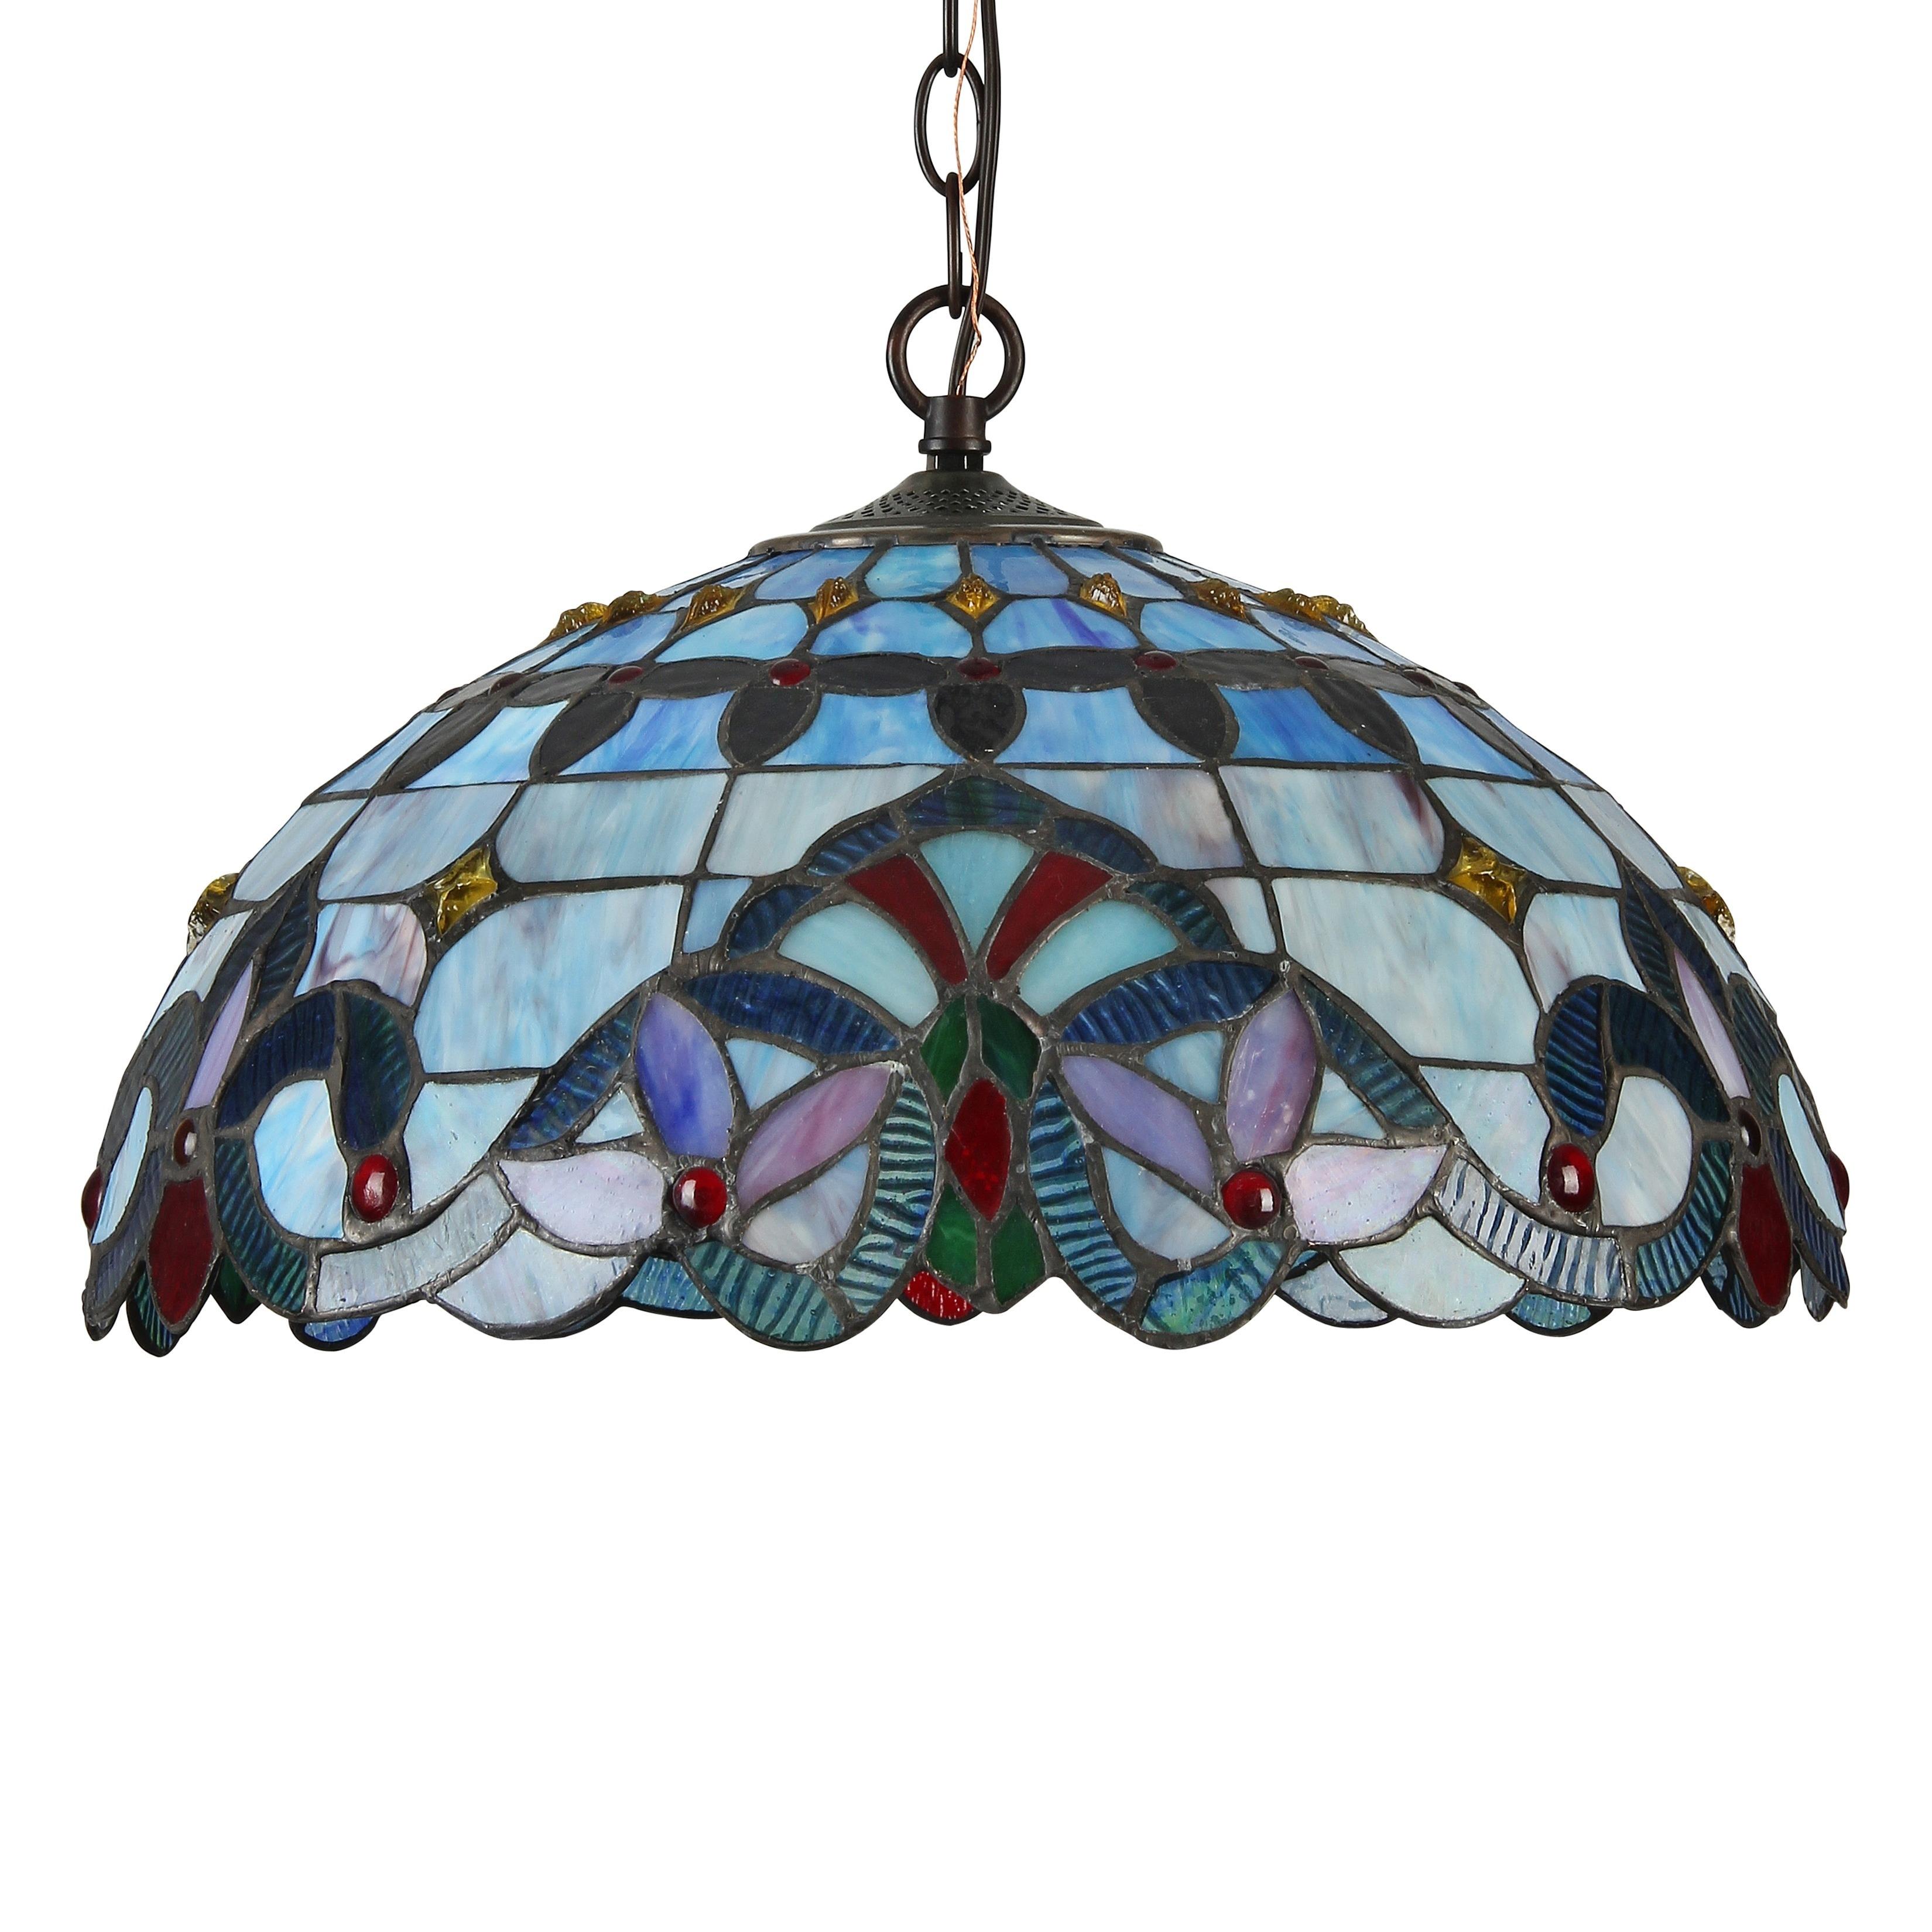 Buy Blue Ceiling Lights Online at Overstock.com | Our Best Lighting ...